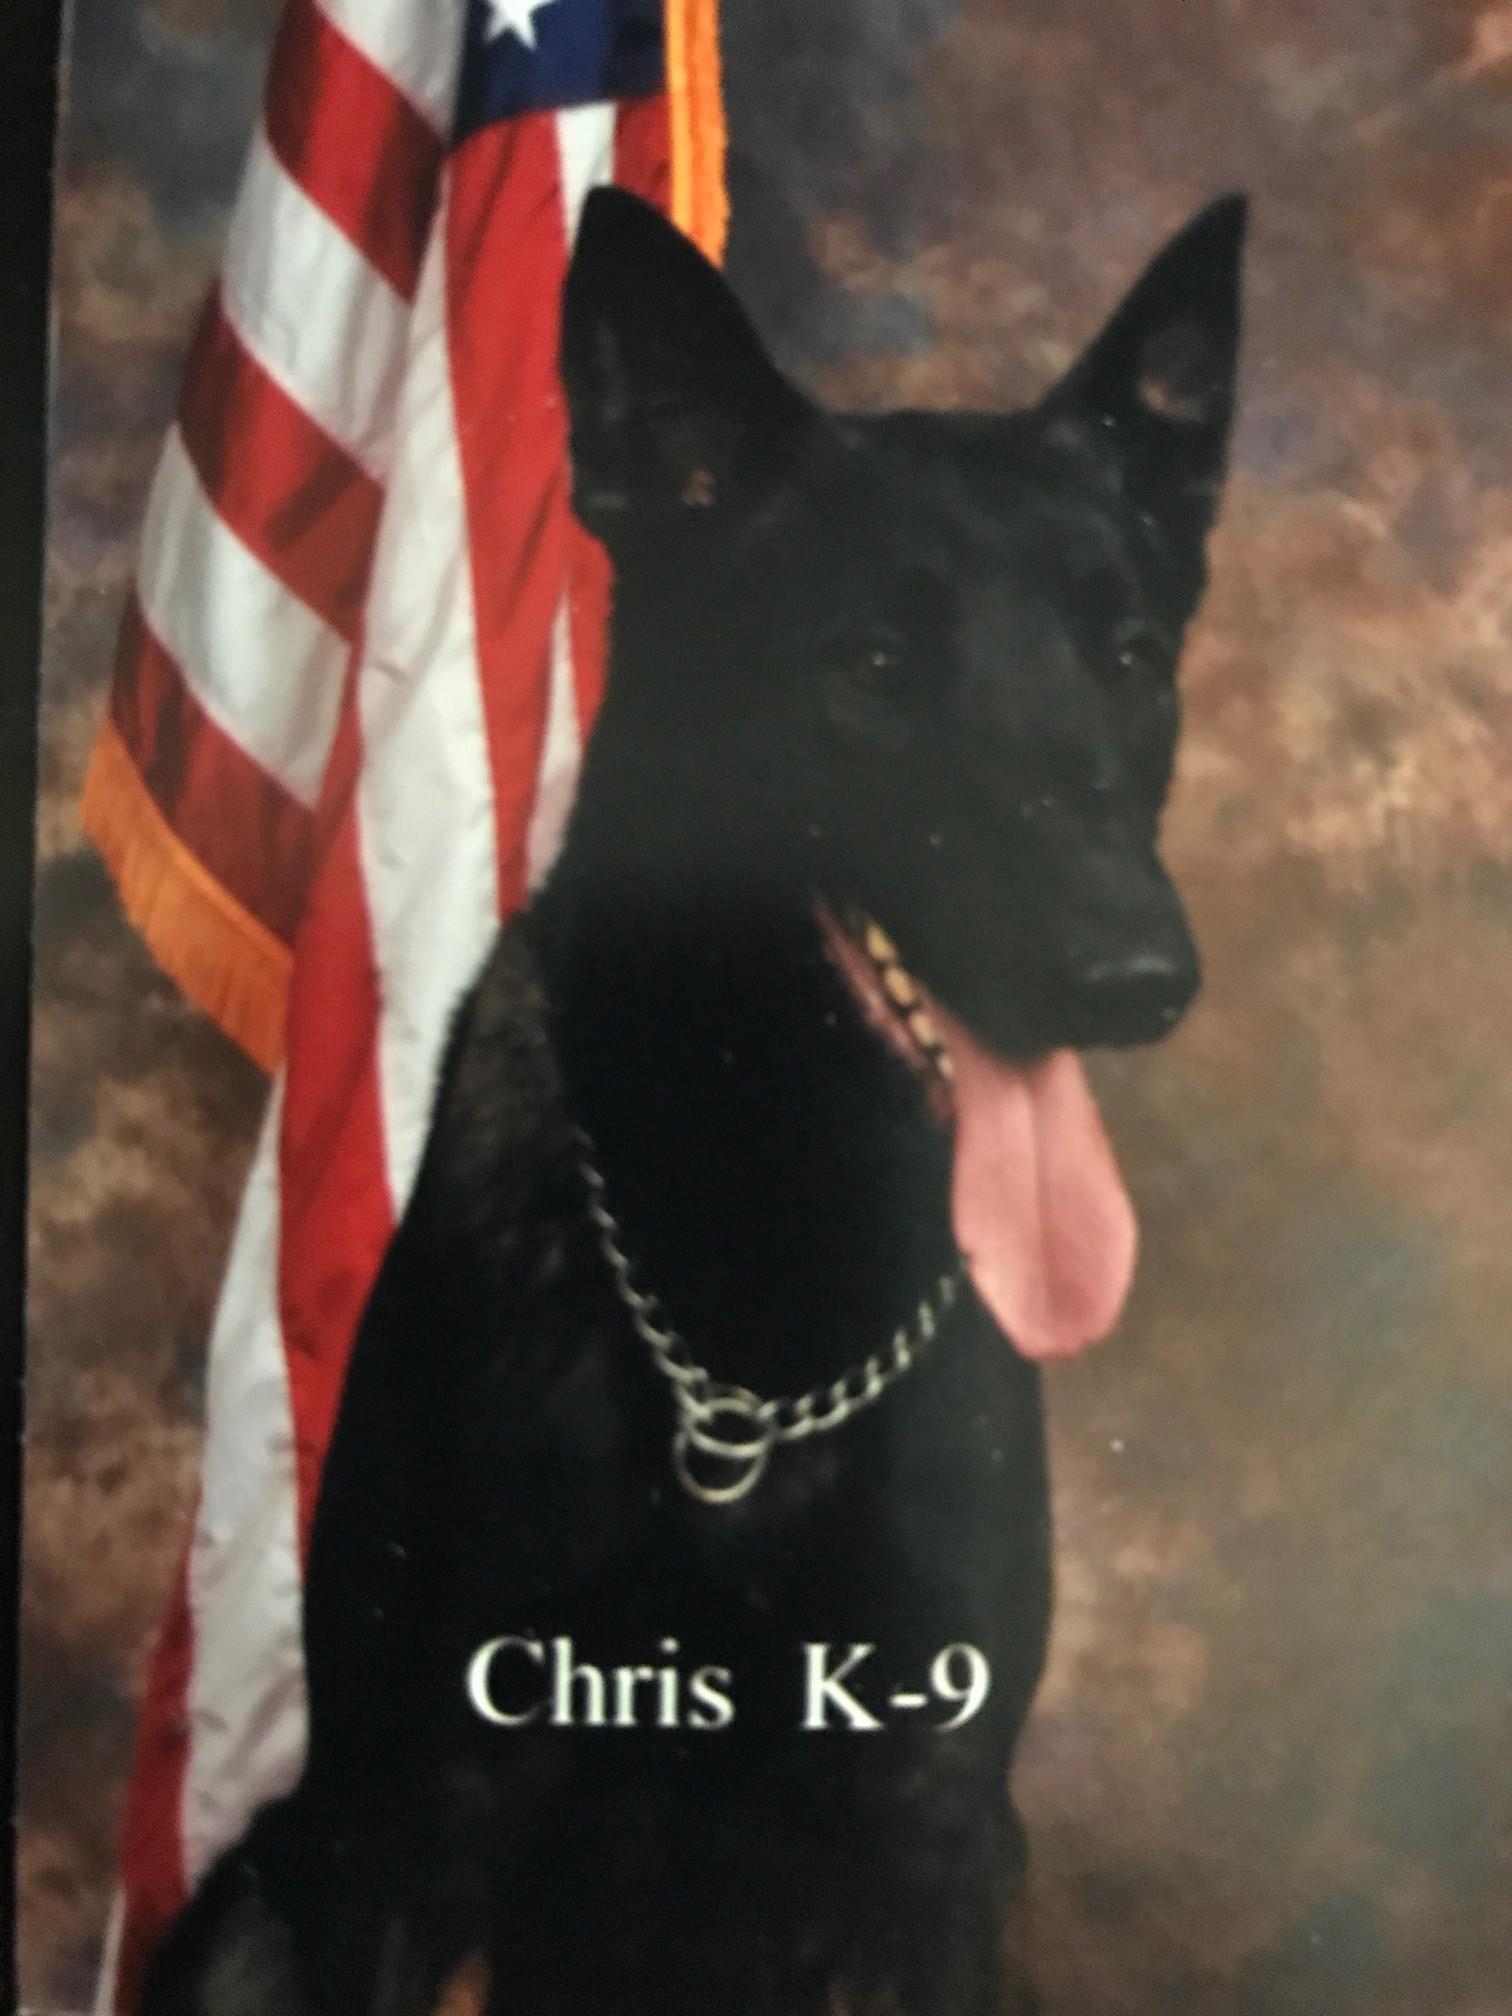 K9 Chris | Yancey County Sheriff's Office, North Carolina